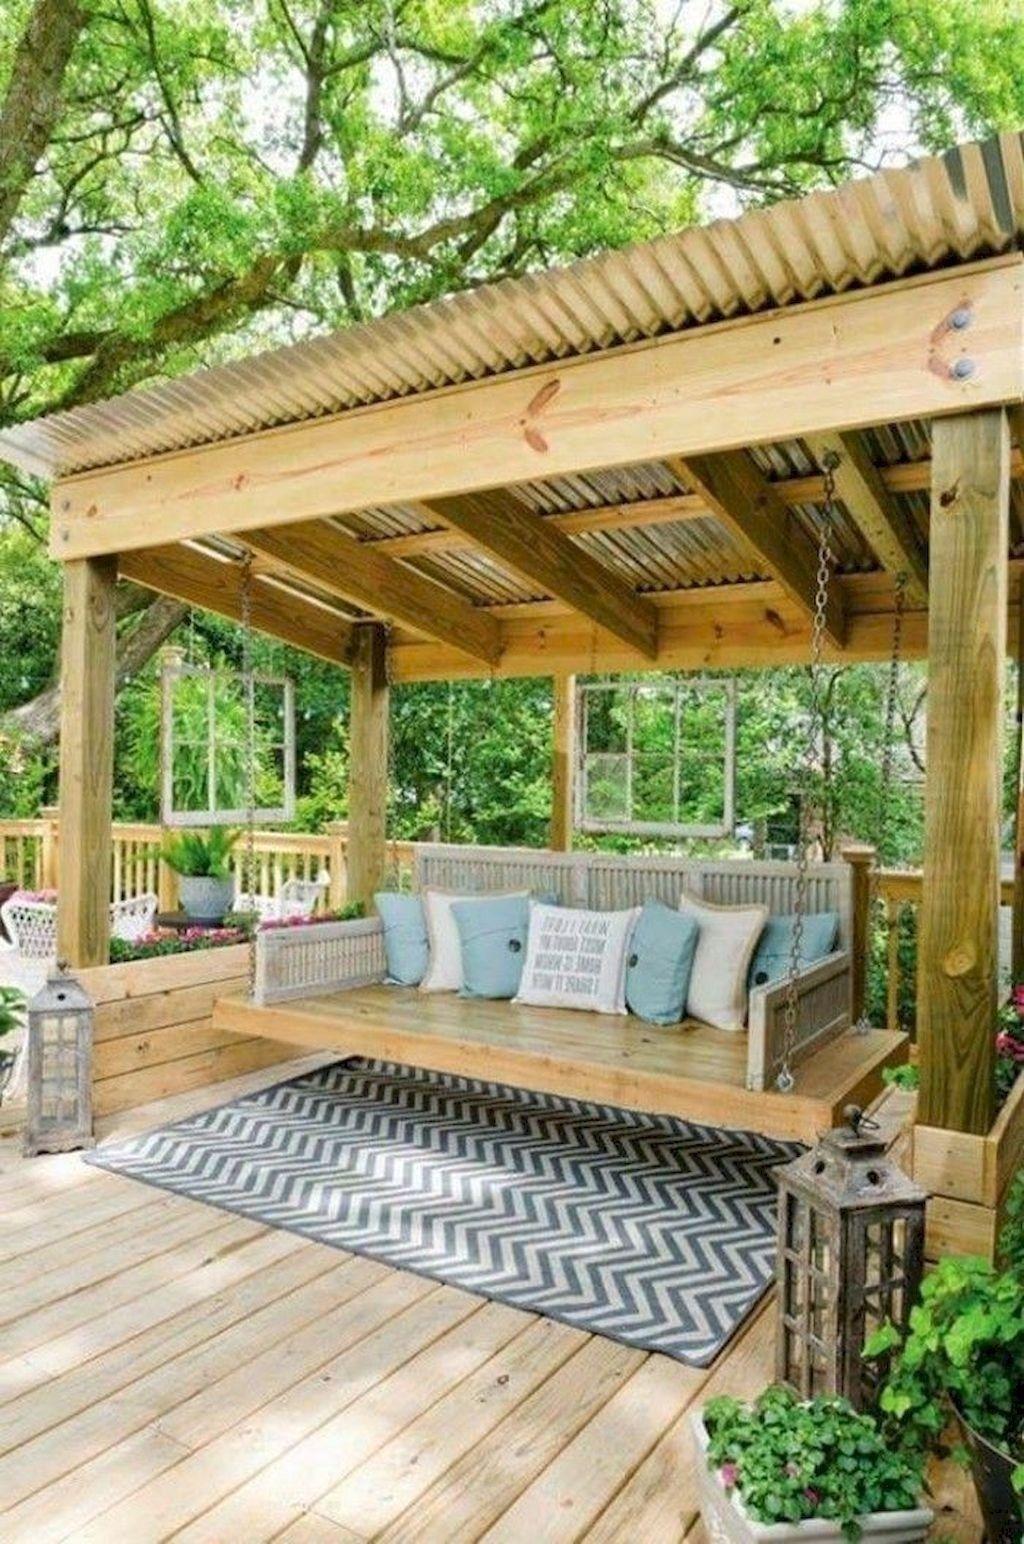 39 exciting diy backyard gazebo design ideas backyard